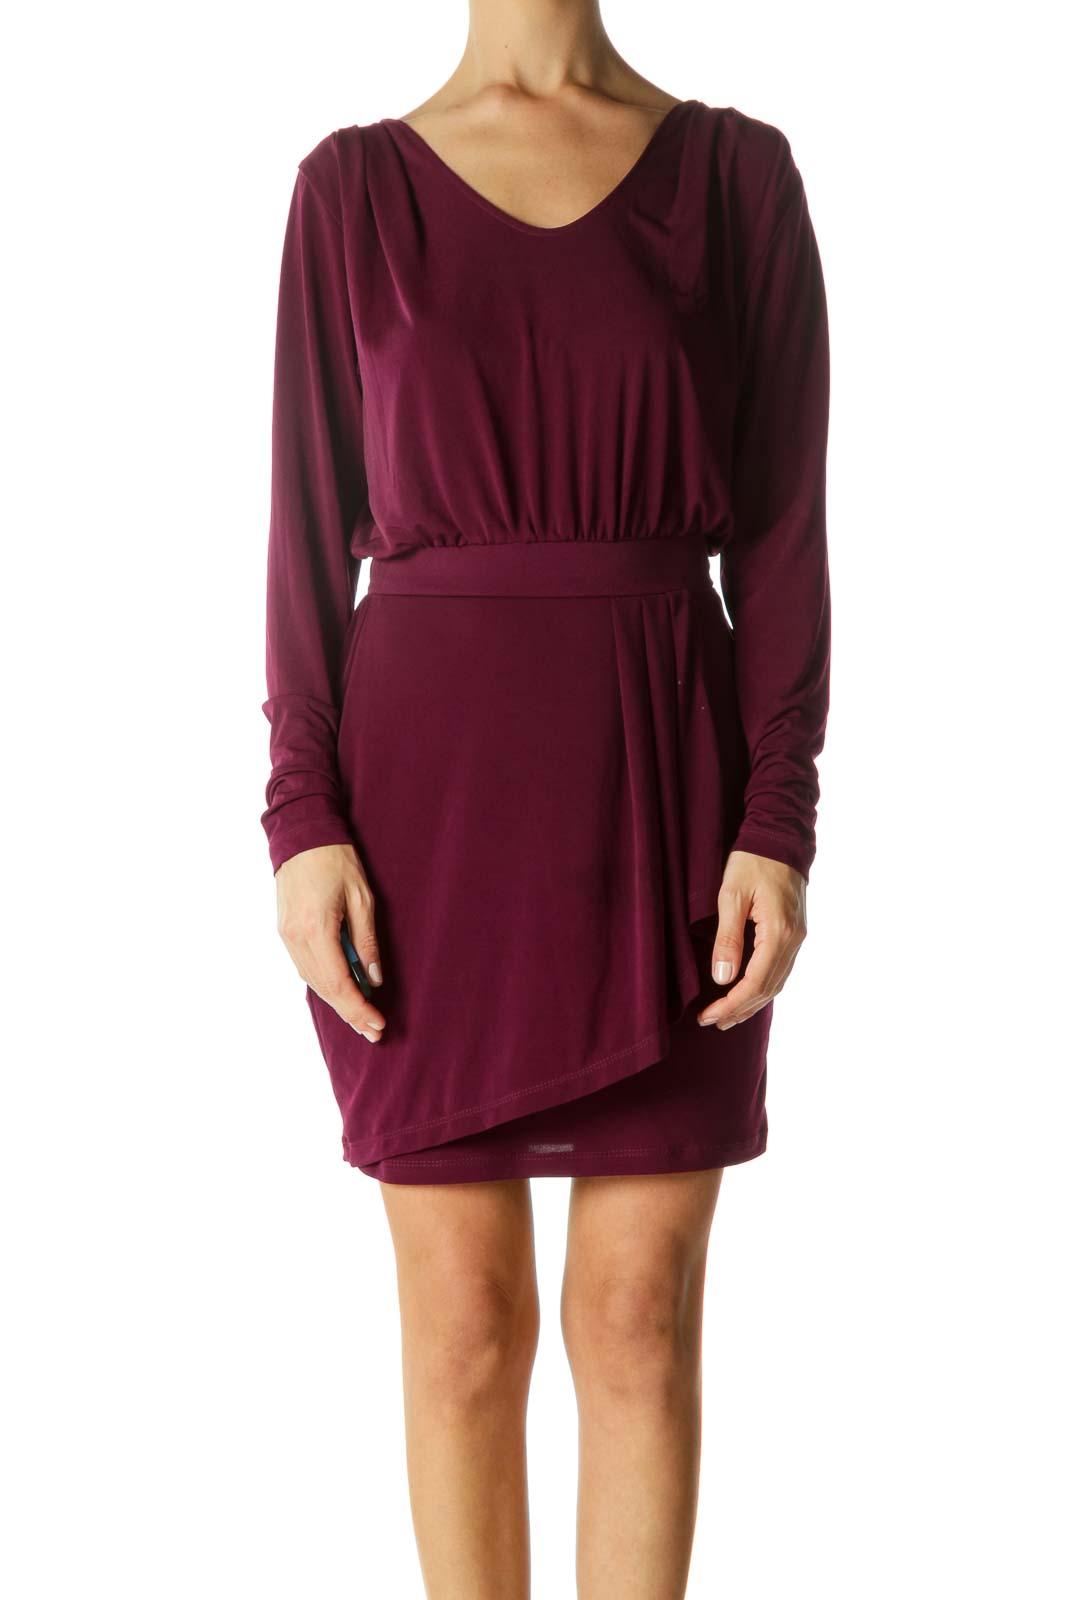 Purple Round Neck Cinched-Waist Stretch Cocktail Dress Front